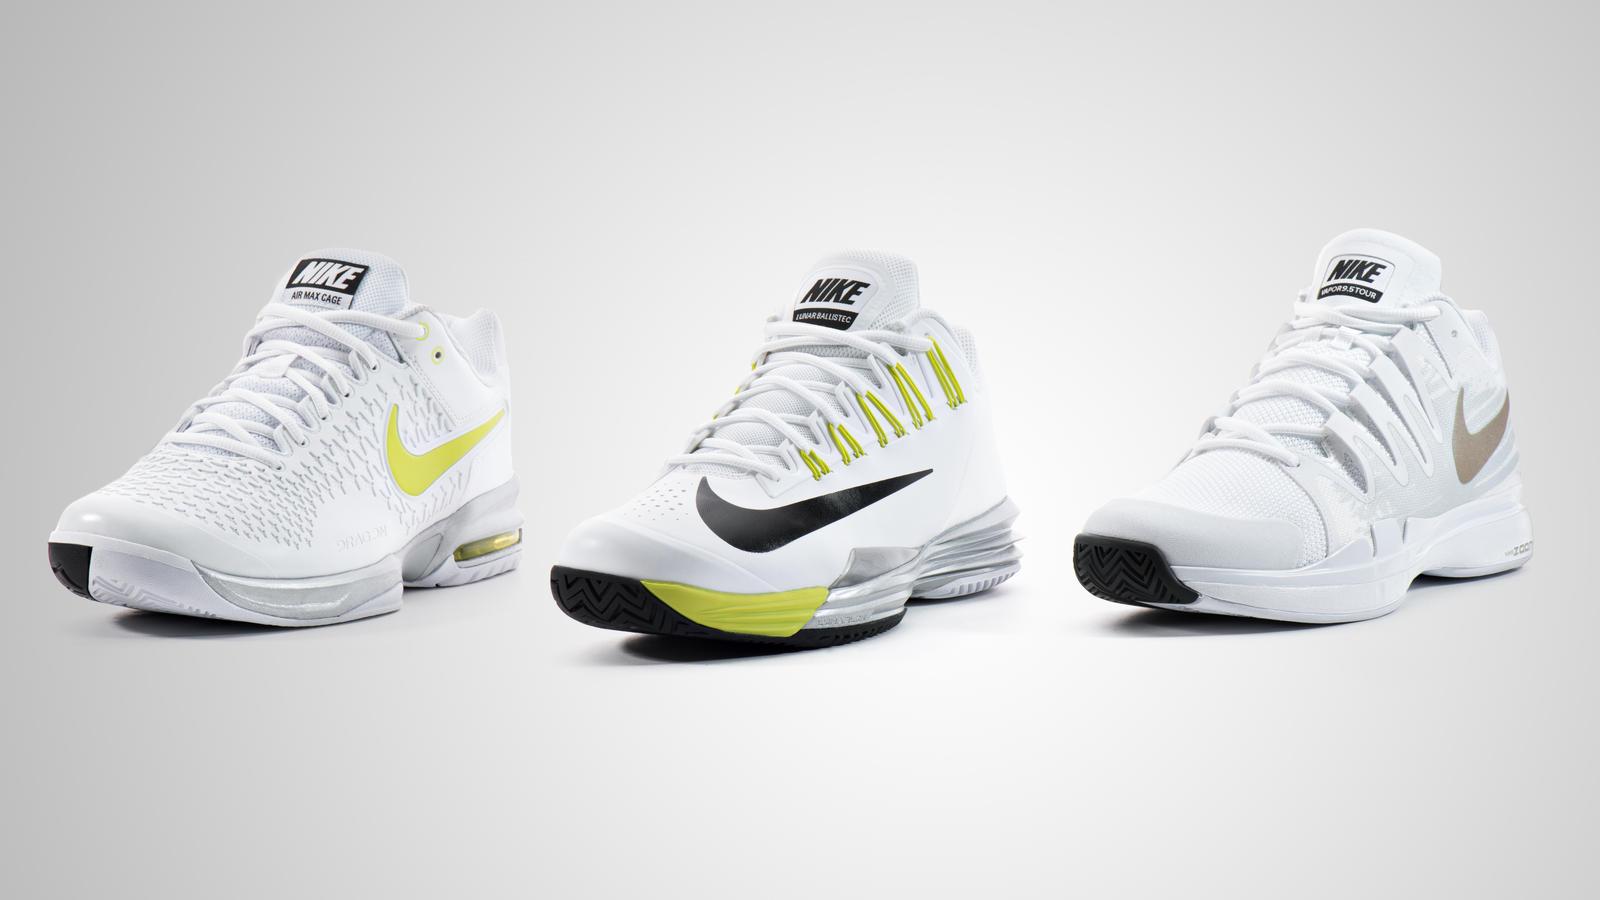 Nike Tennis Men's Footwear - London 2014